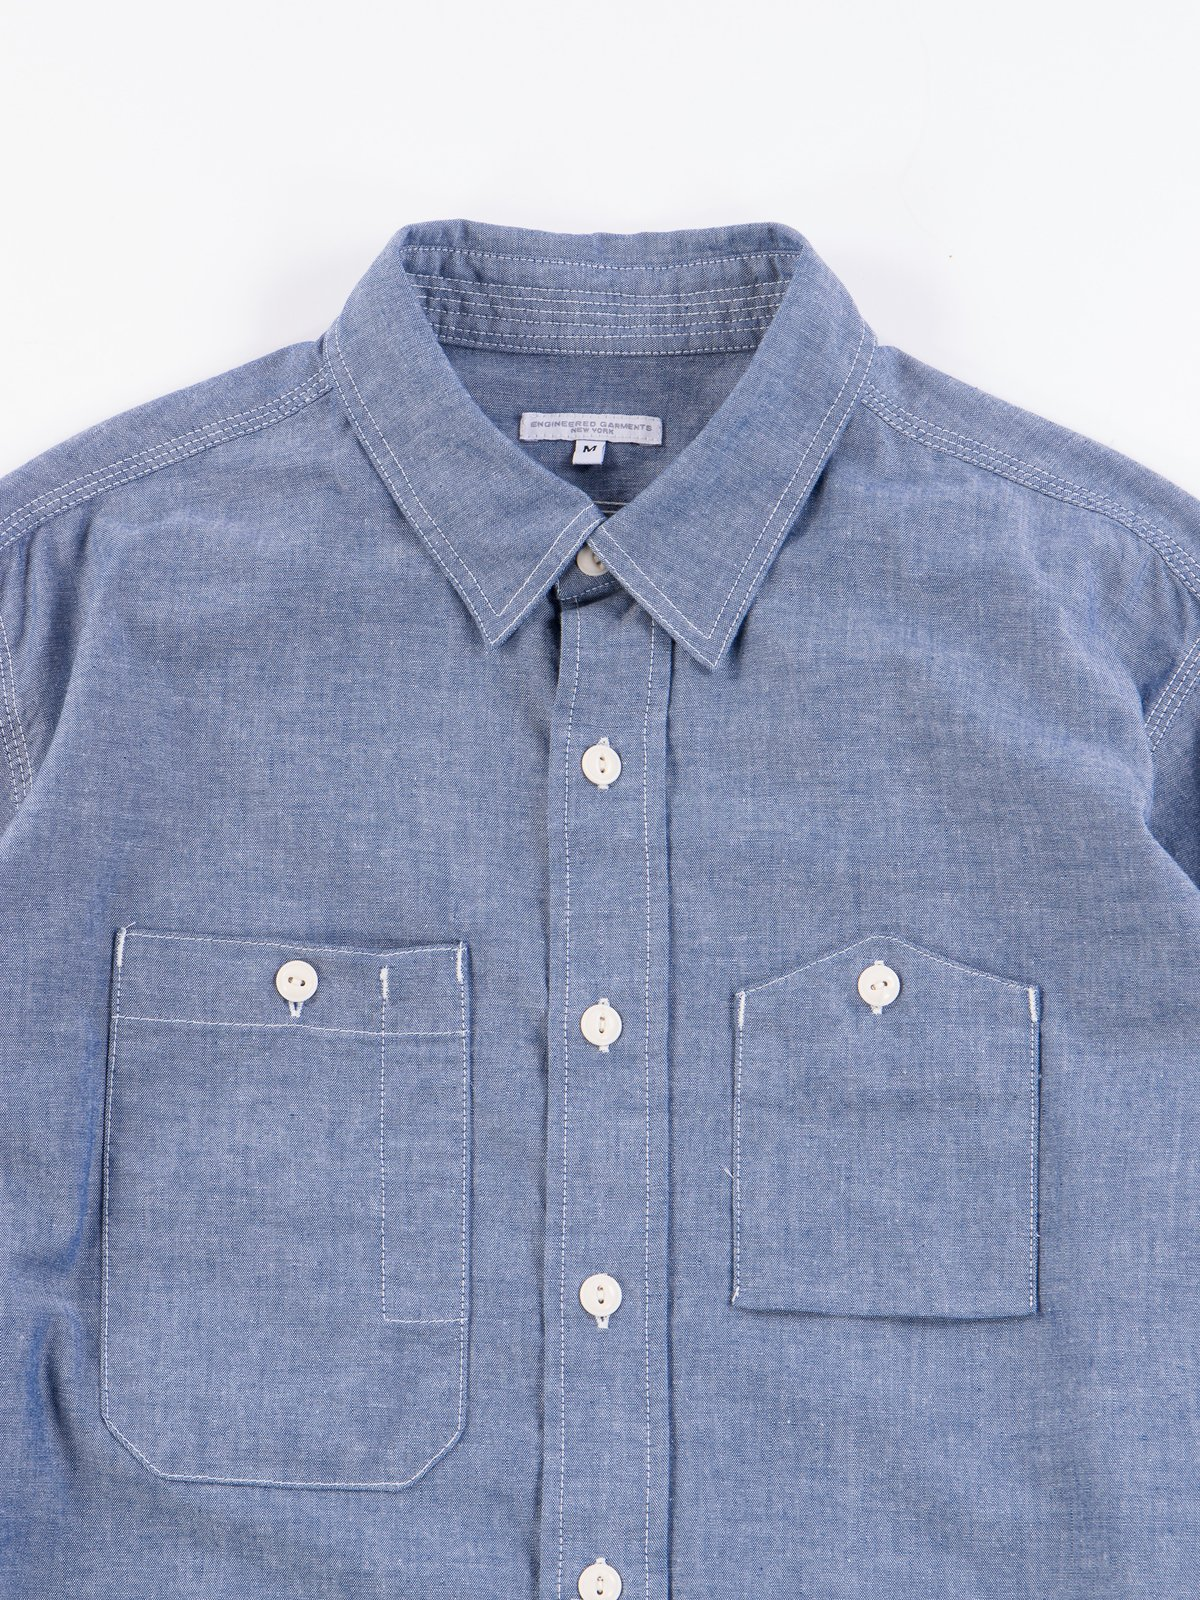 Blue Cotton Chambray Work Shirt - Image 3